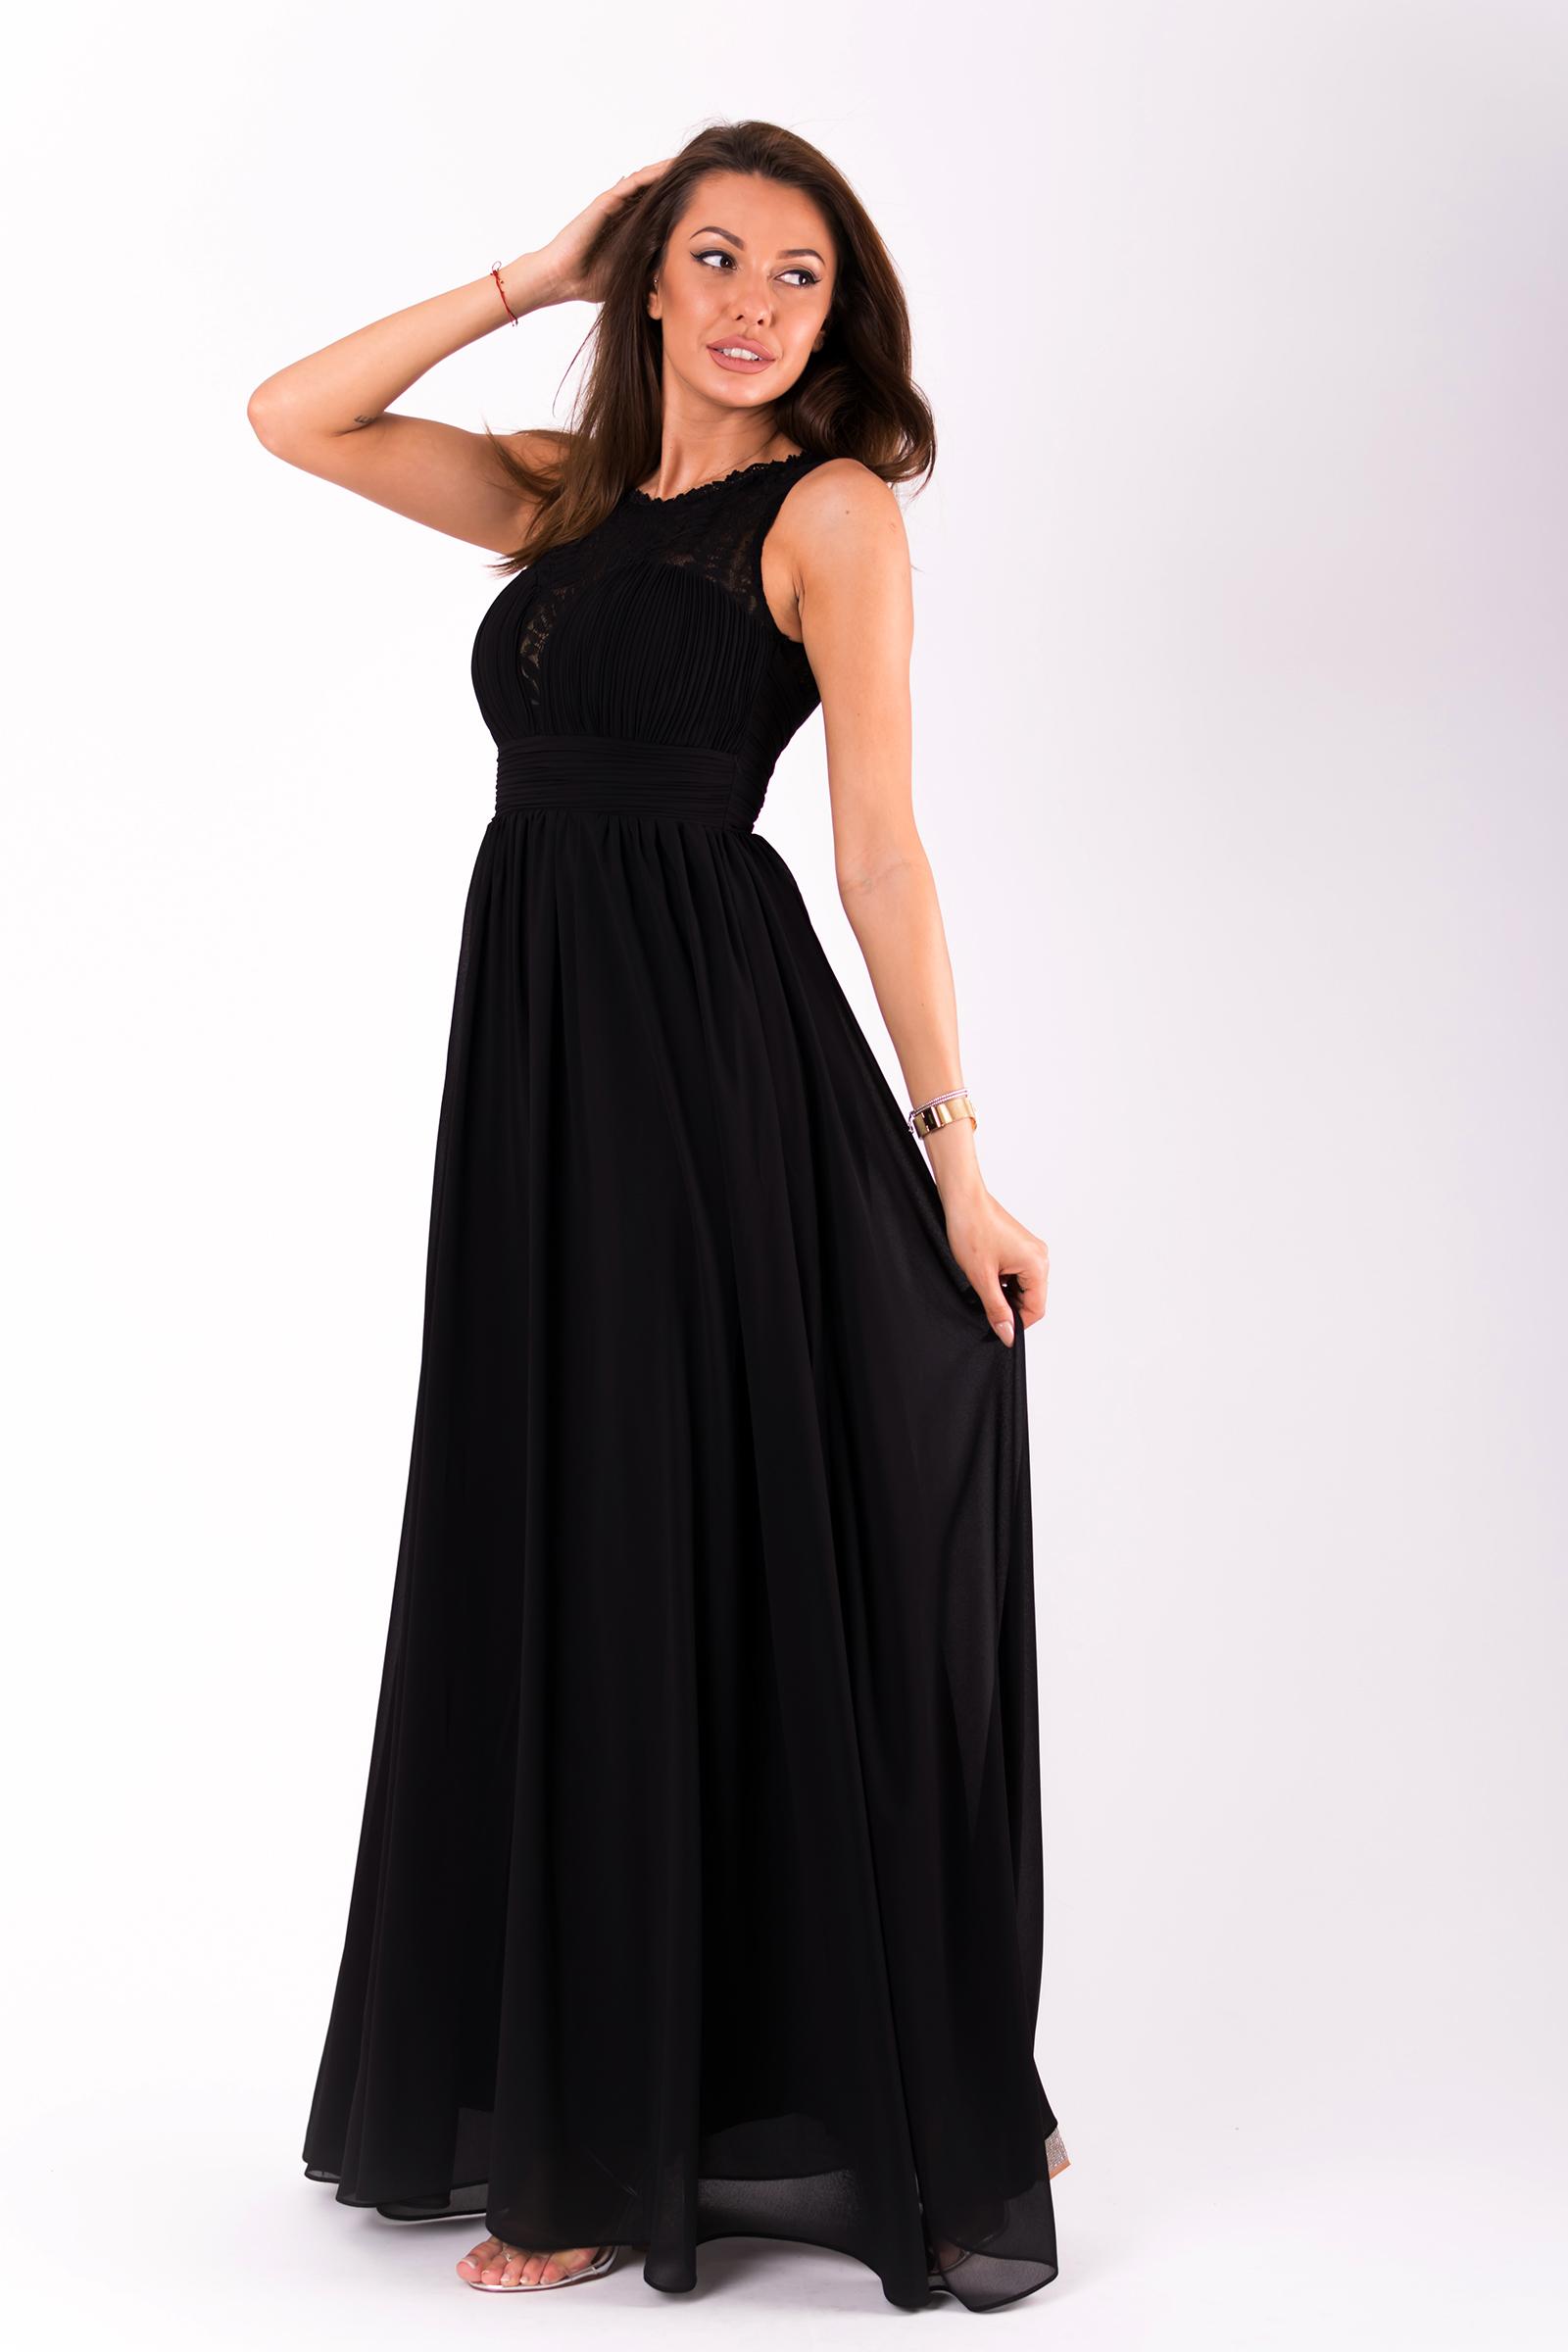 b4dfc75b458 Must maksikleit L0545 | Kleidid | Pidulikud kleidid | Maksikleidid ...